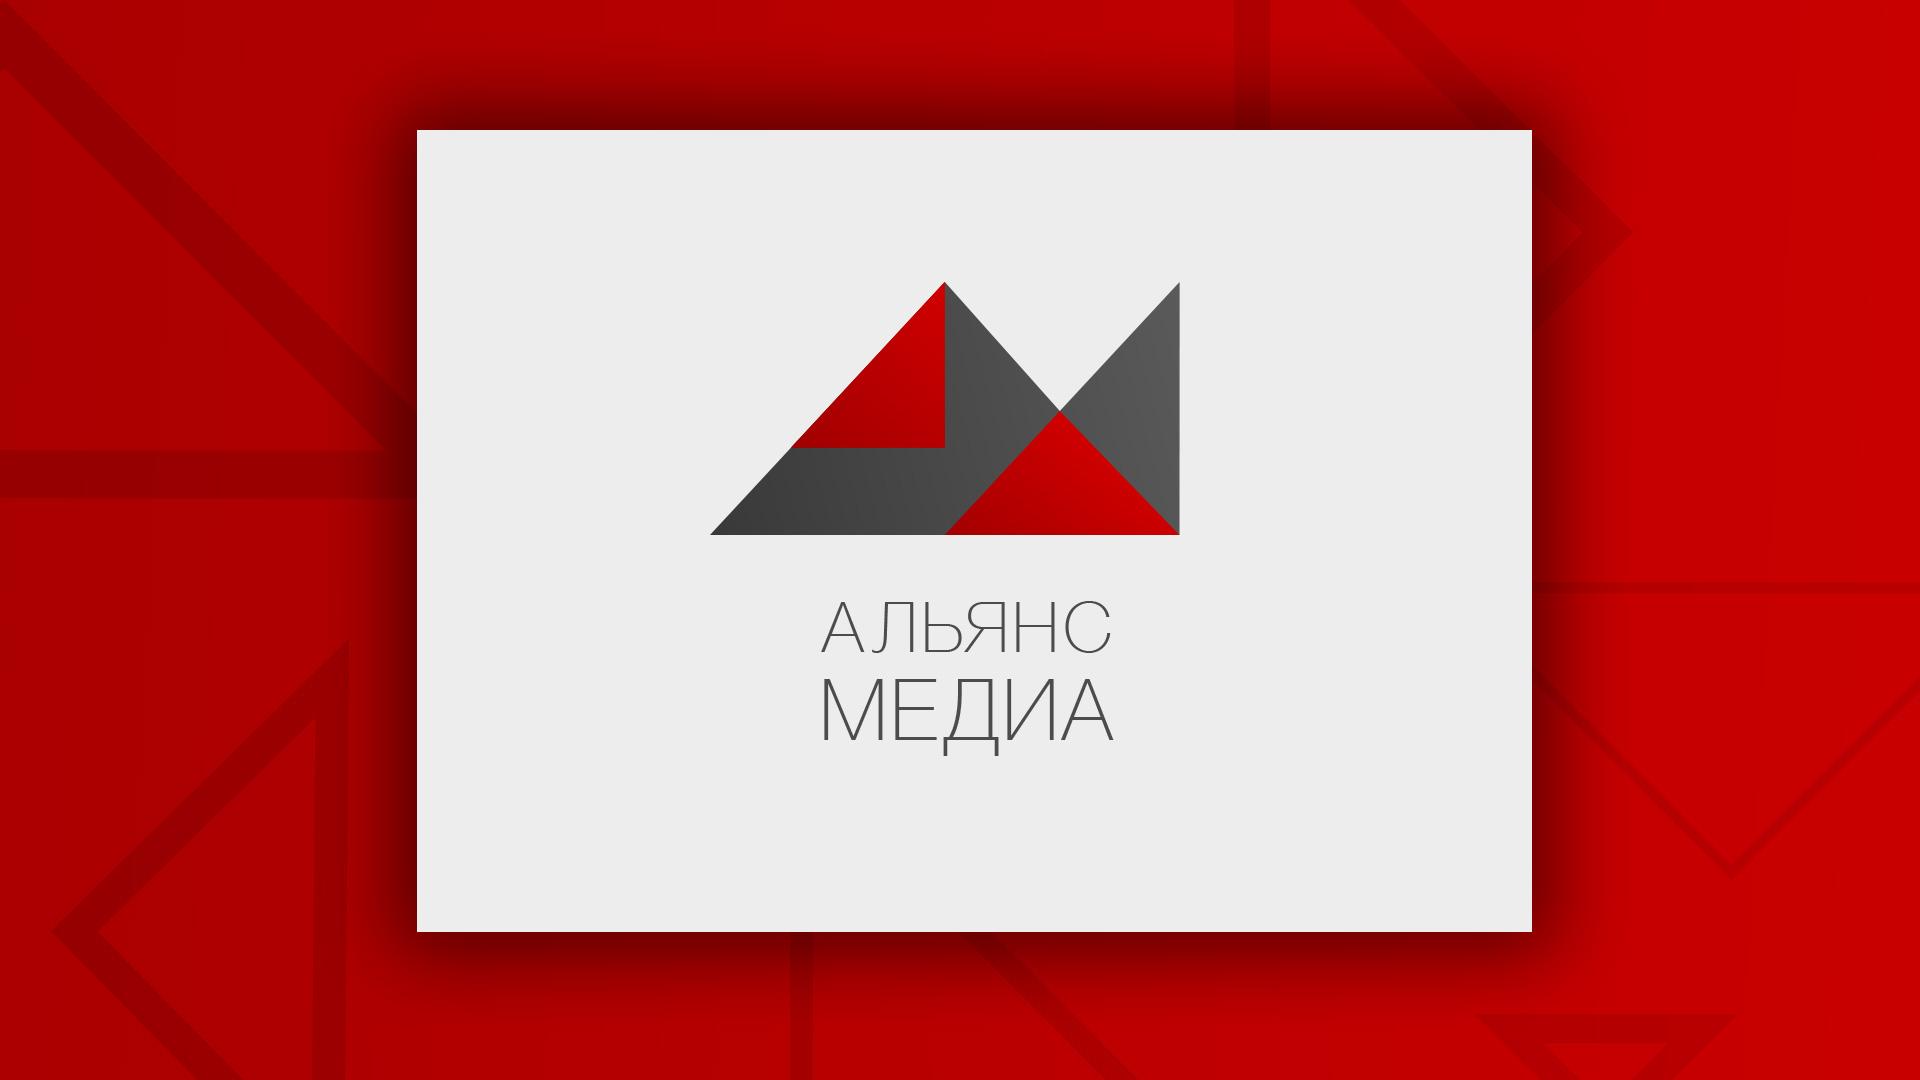 Создать логотип для компании фото f_2825ab14dcd28243.jpg